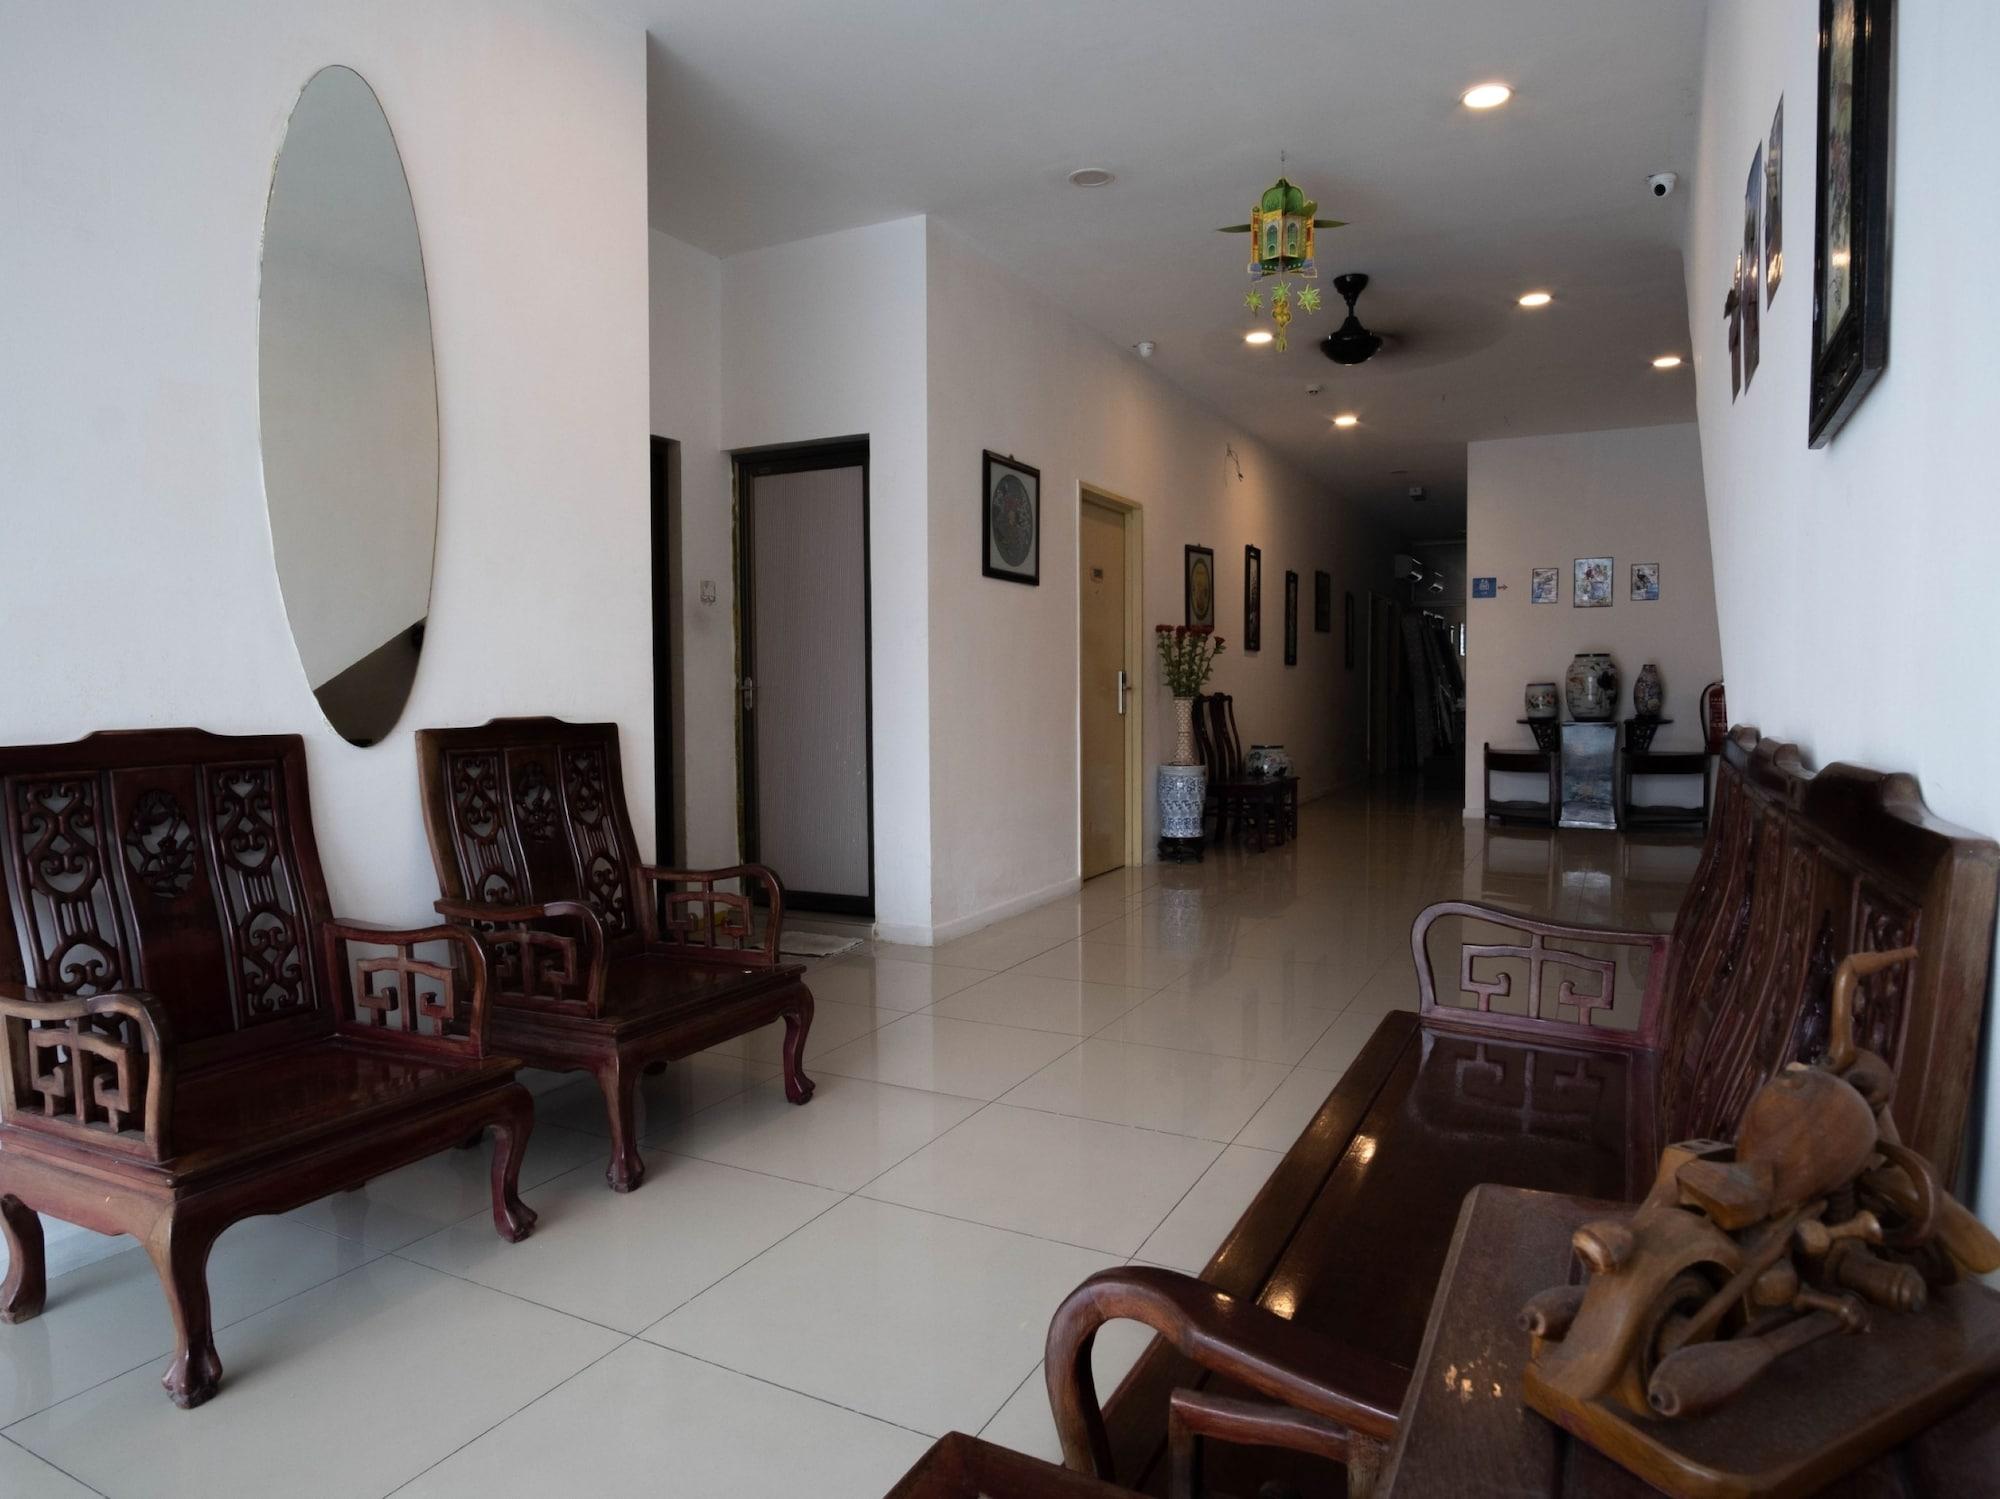 OYO 44103 8 Hotel, Seremban